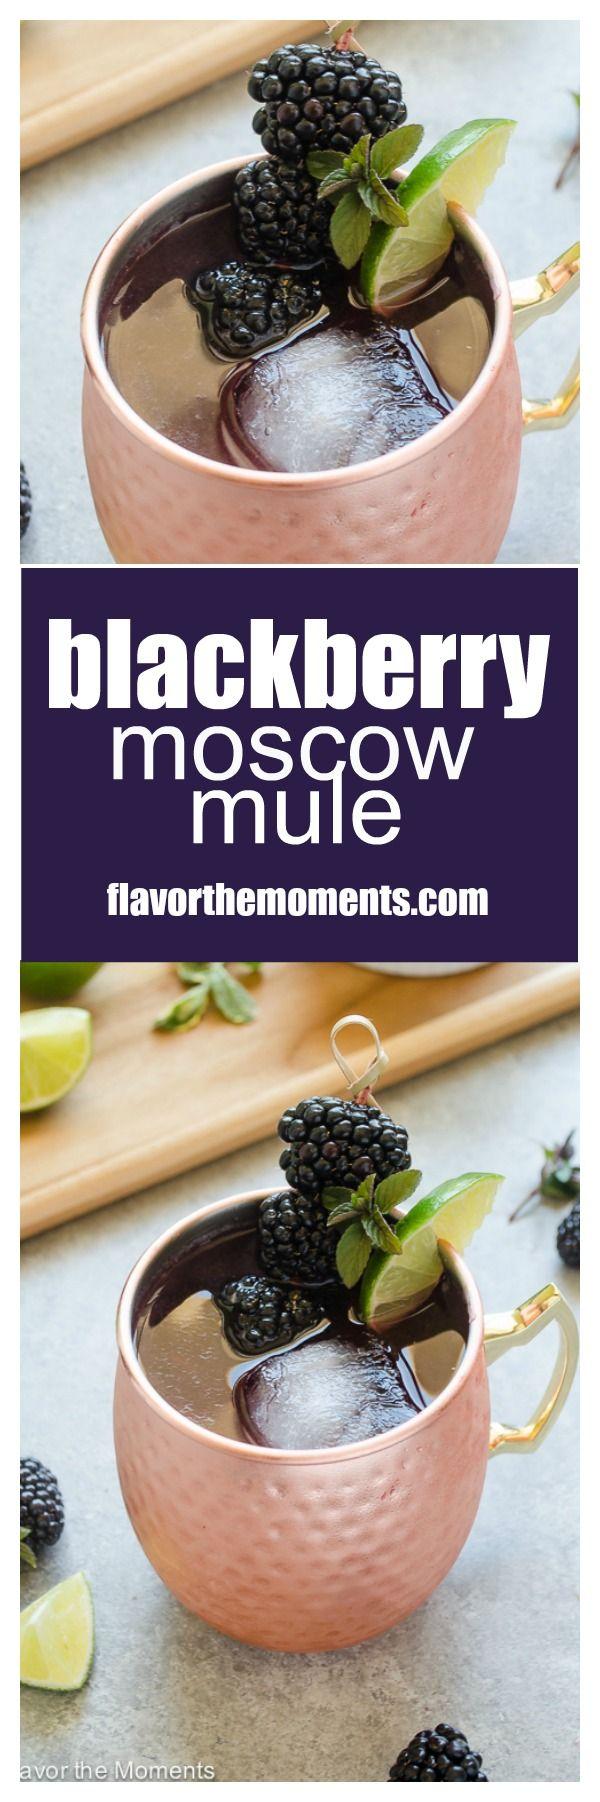 Blackberry Moscow Mule